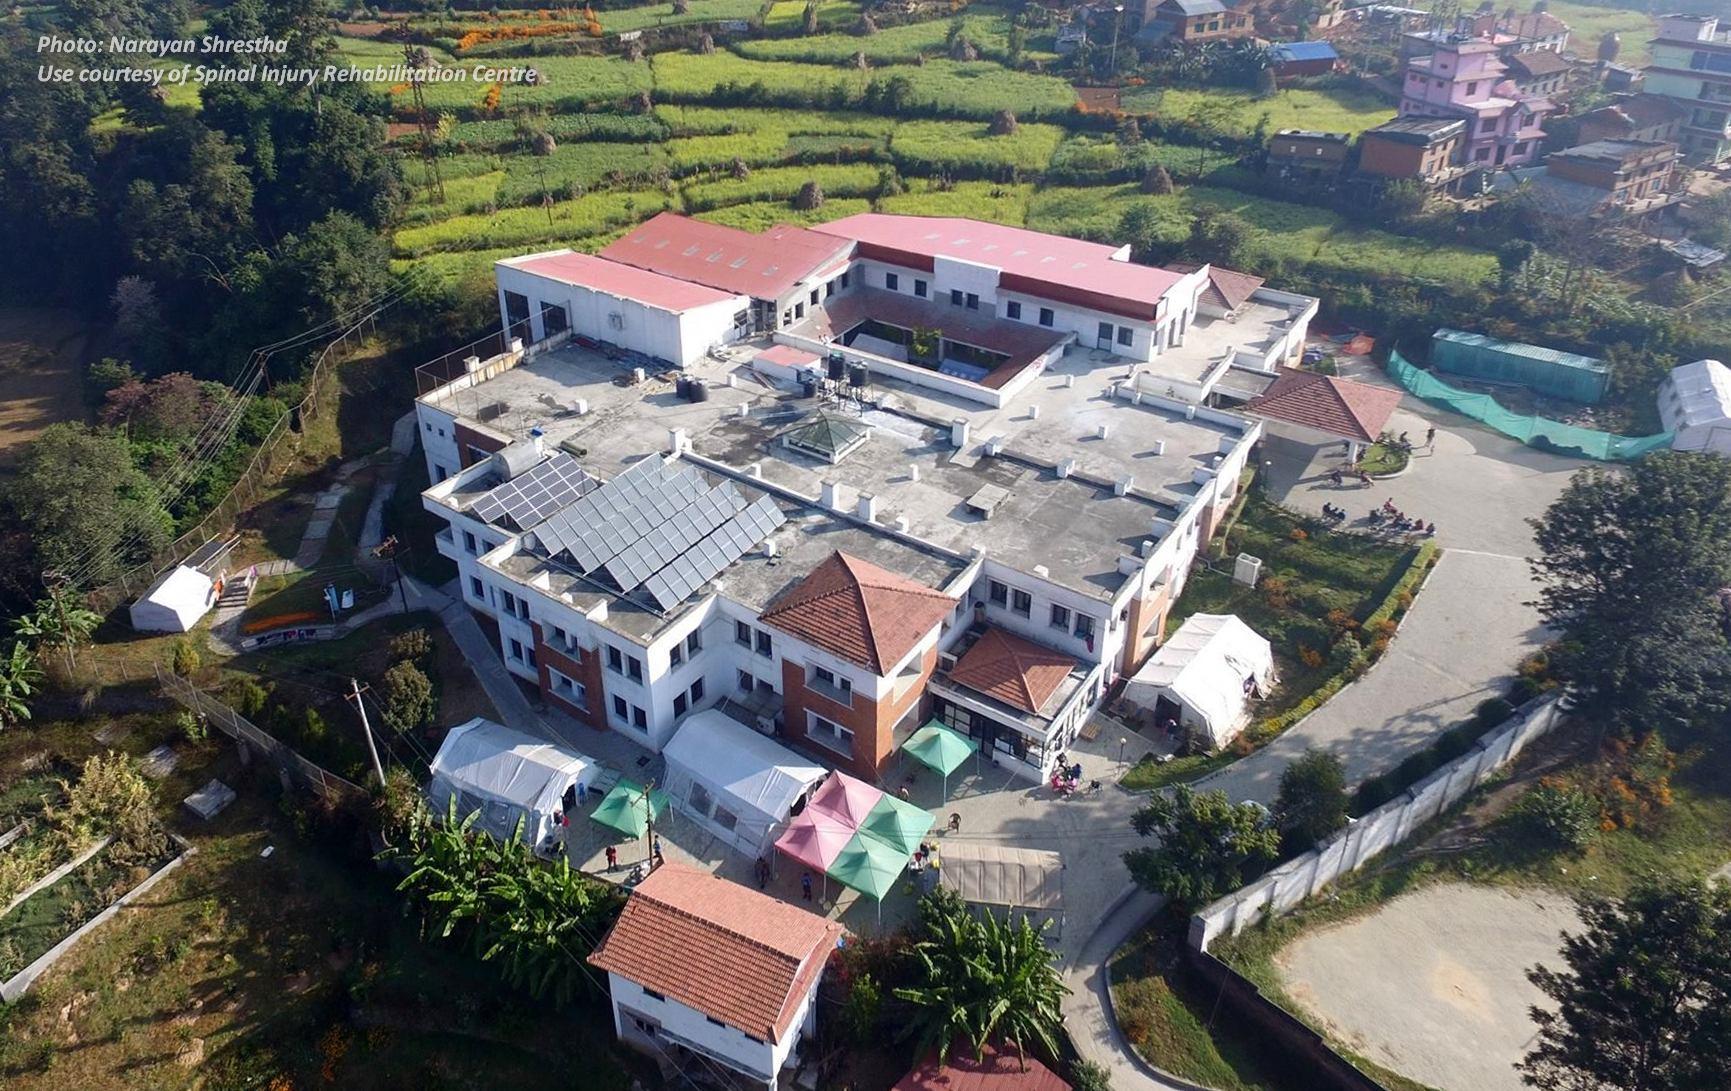 Drone image by Narayan Shrestha 1 cropped